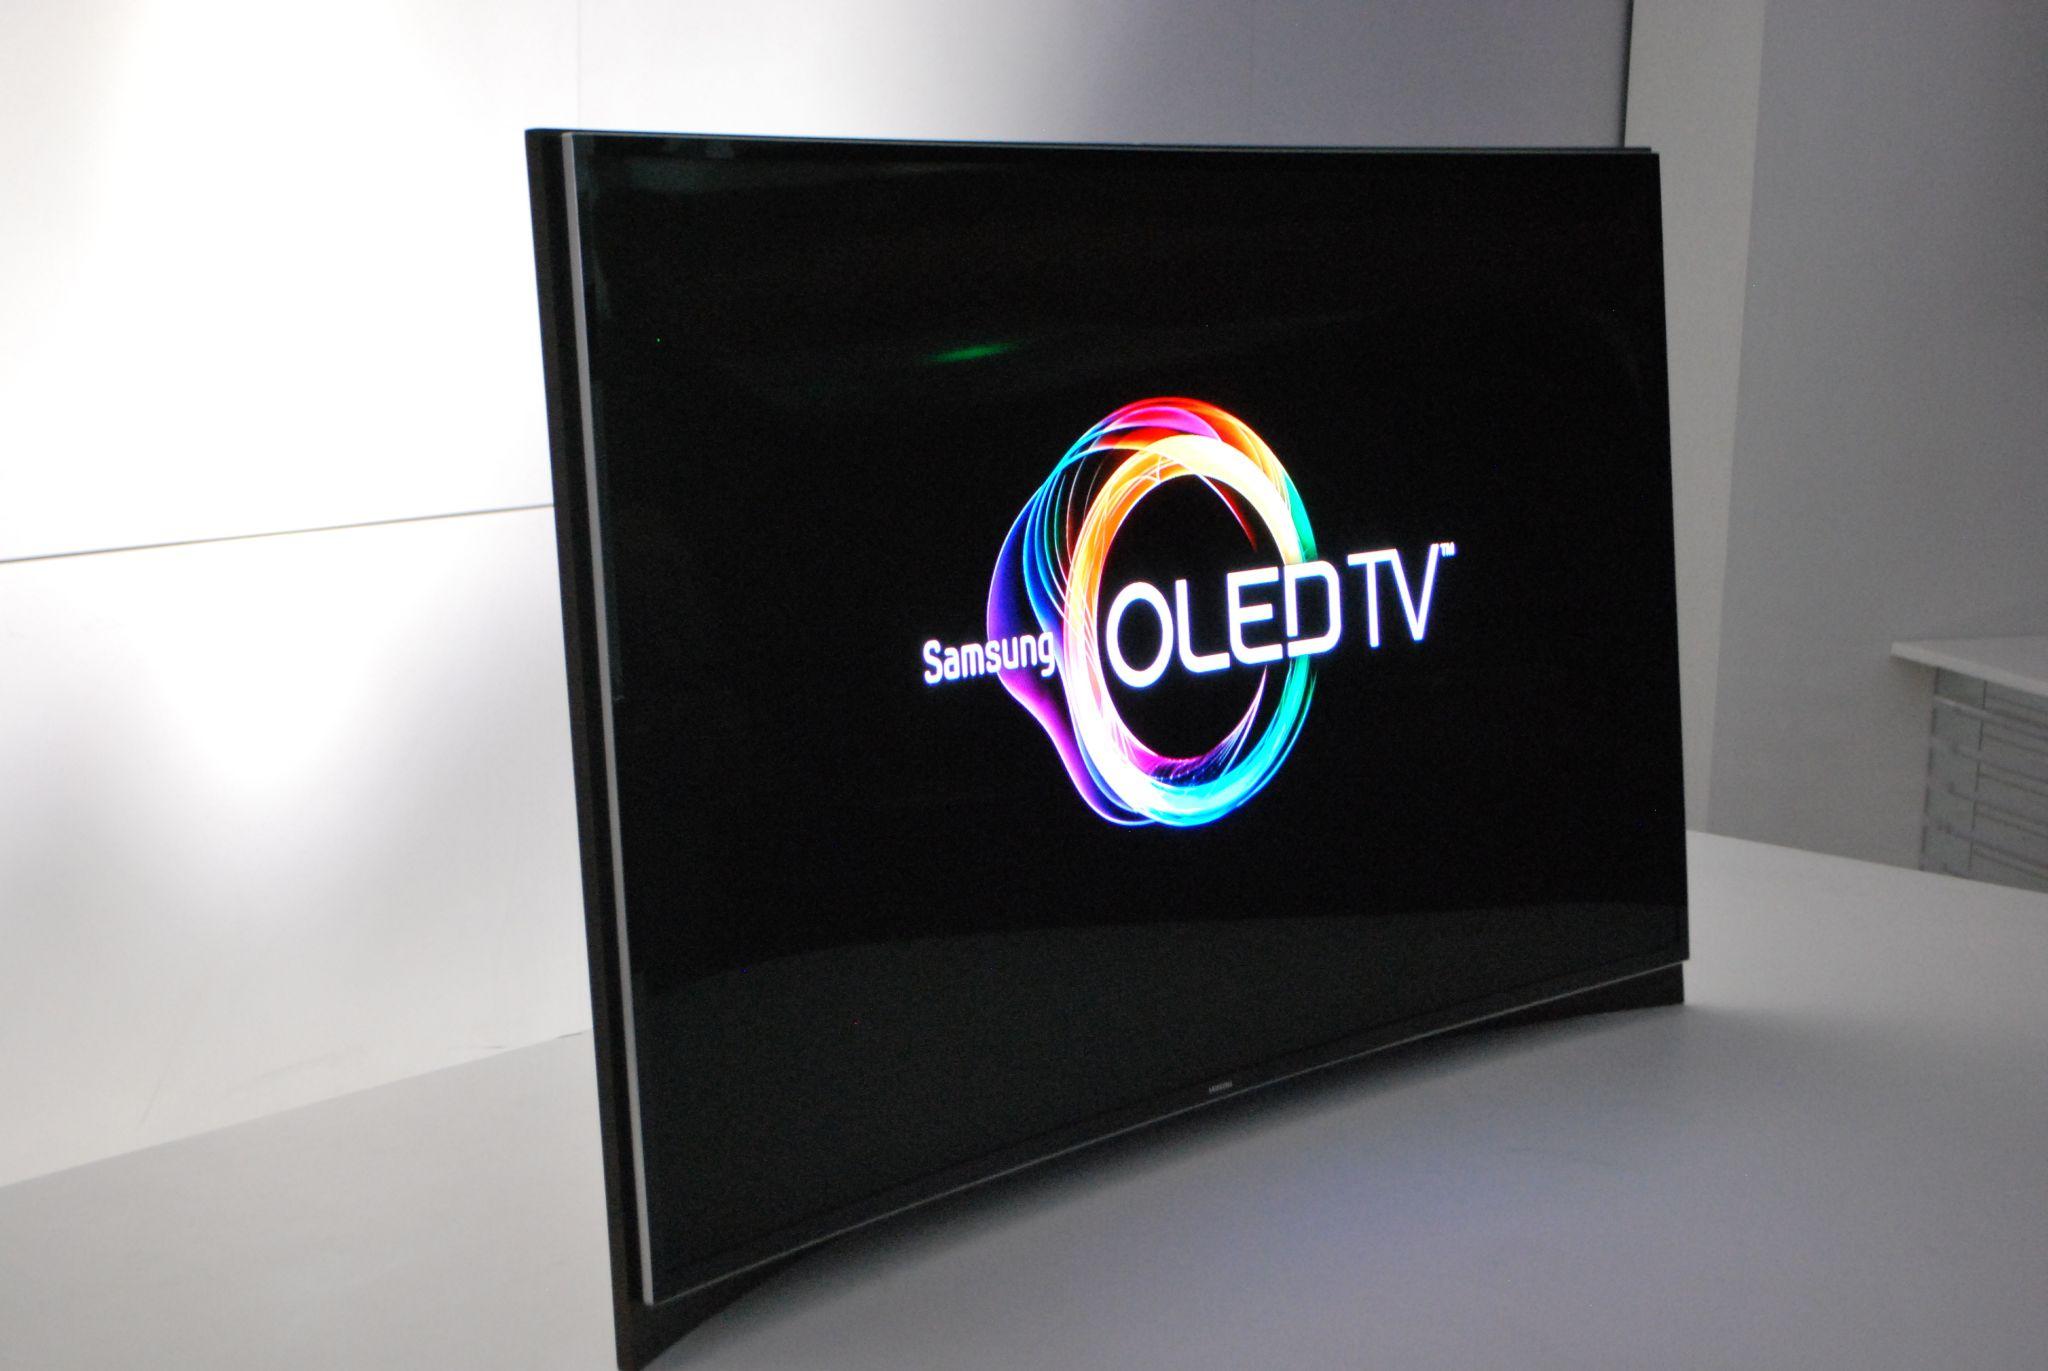 Telewizory OLED tańsze niż LCD, dzięki drukarce